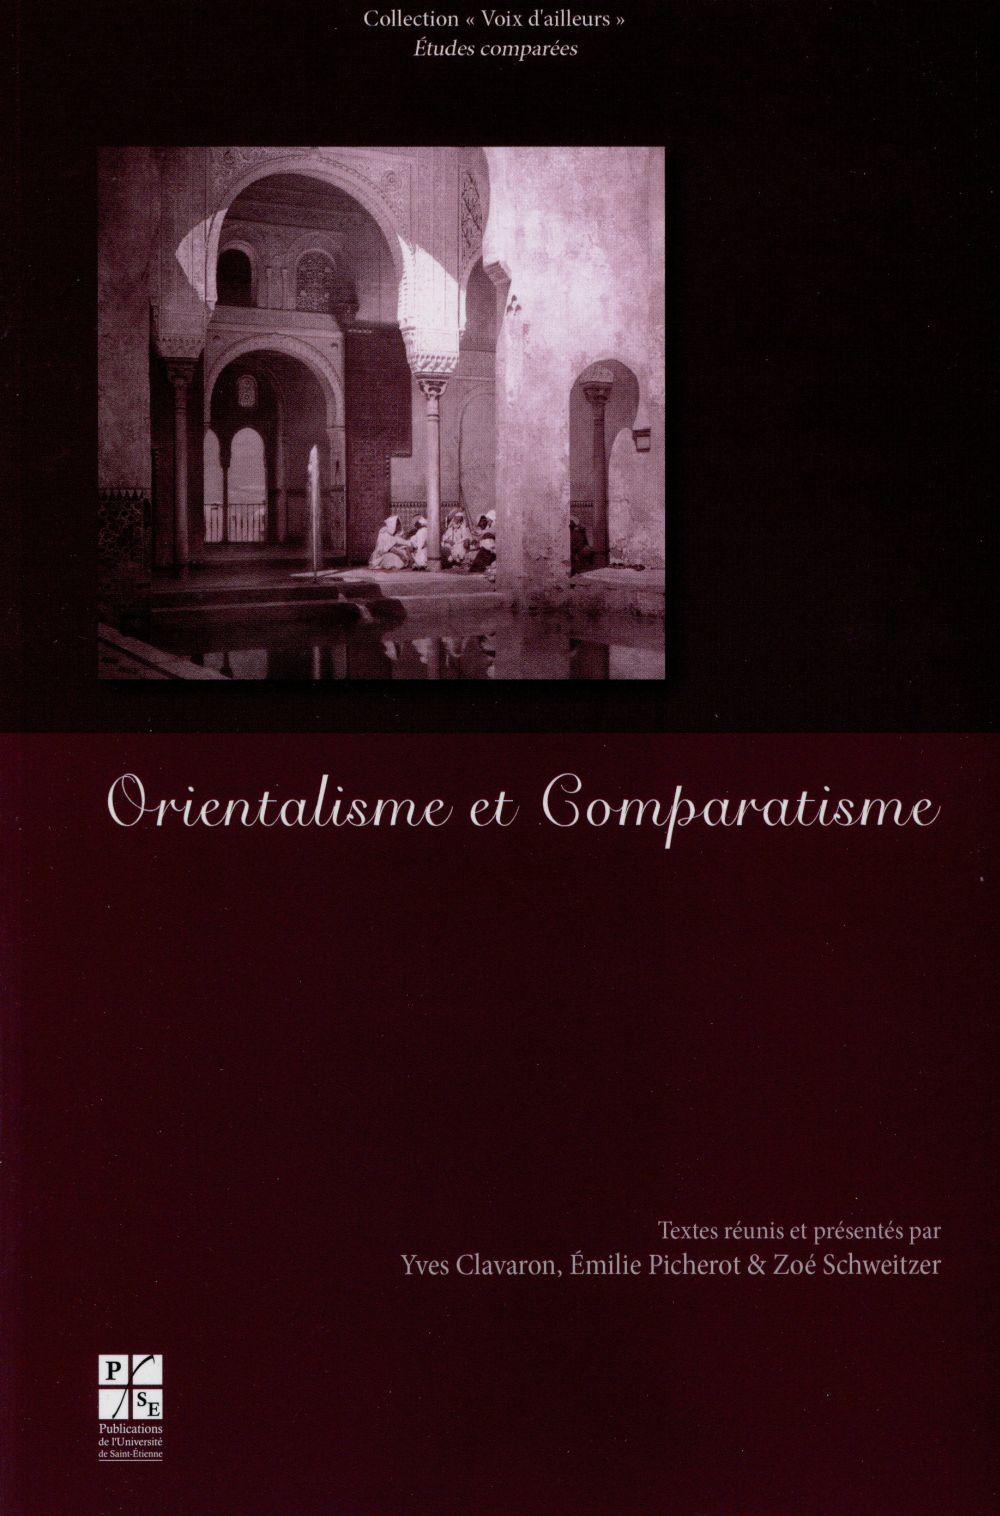 ORIENTALISME ET COMPARATISME